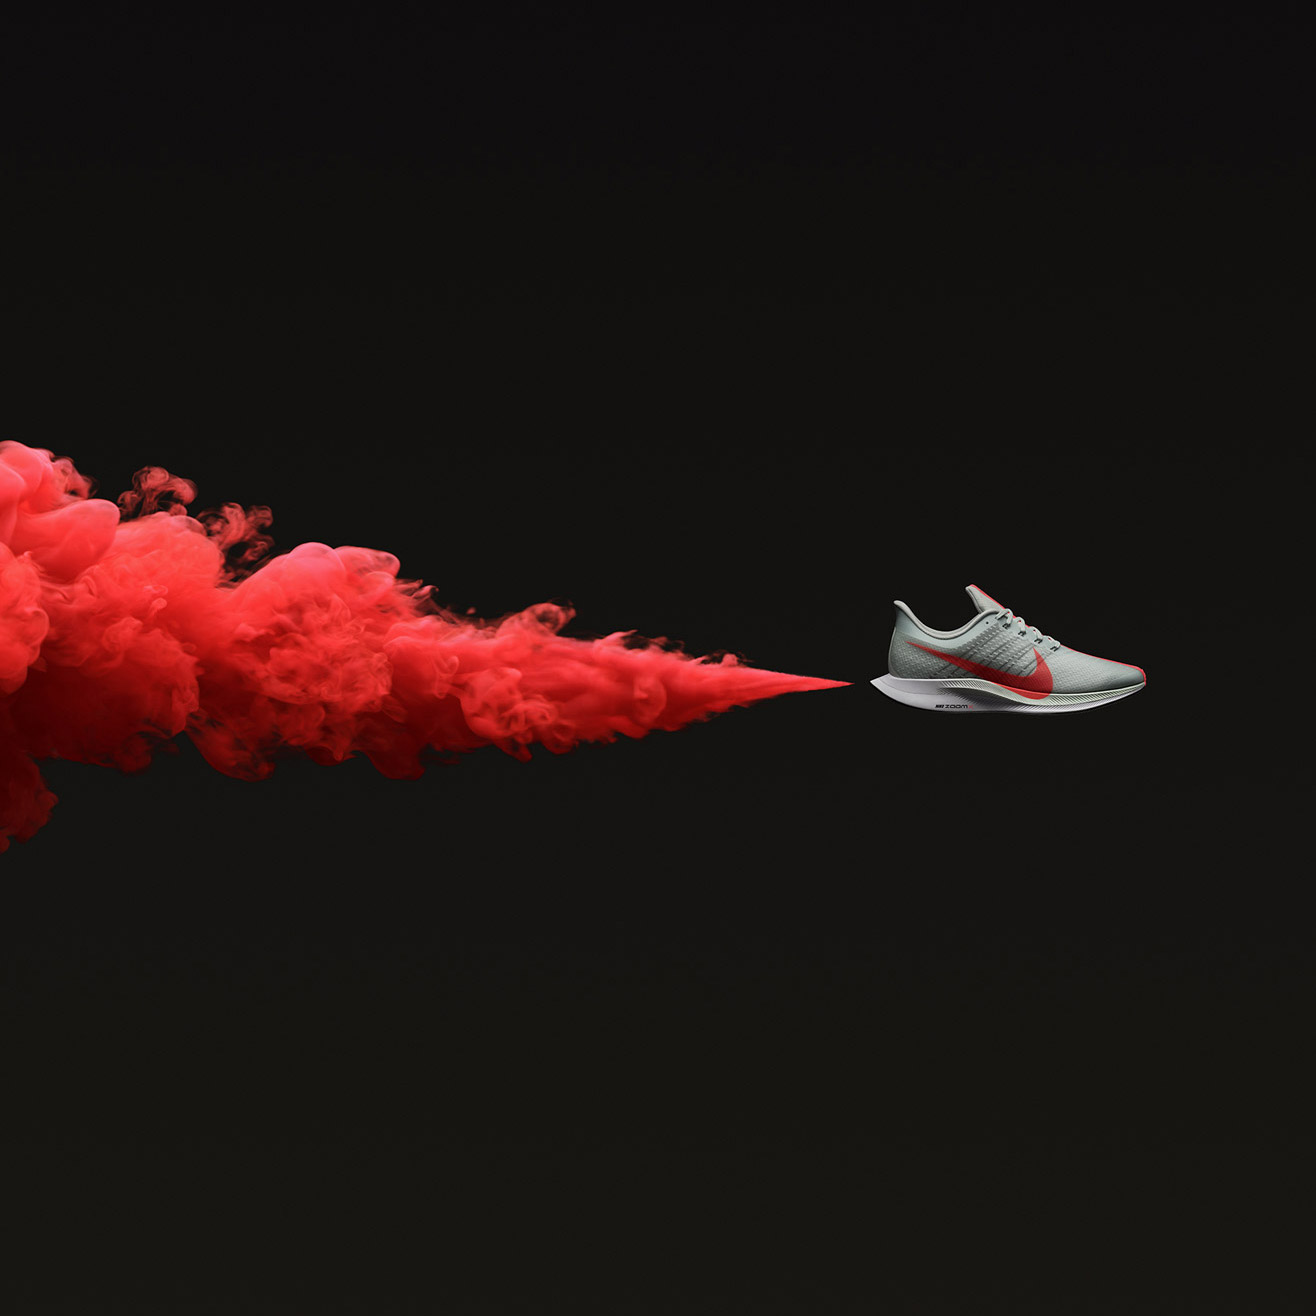 2681c1ffece Nike adapts super-fast marathon shoe for everyday wear